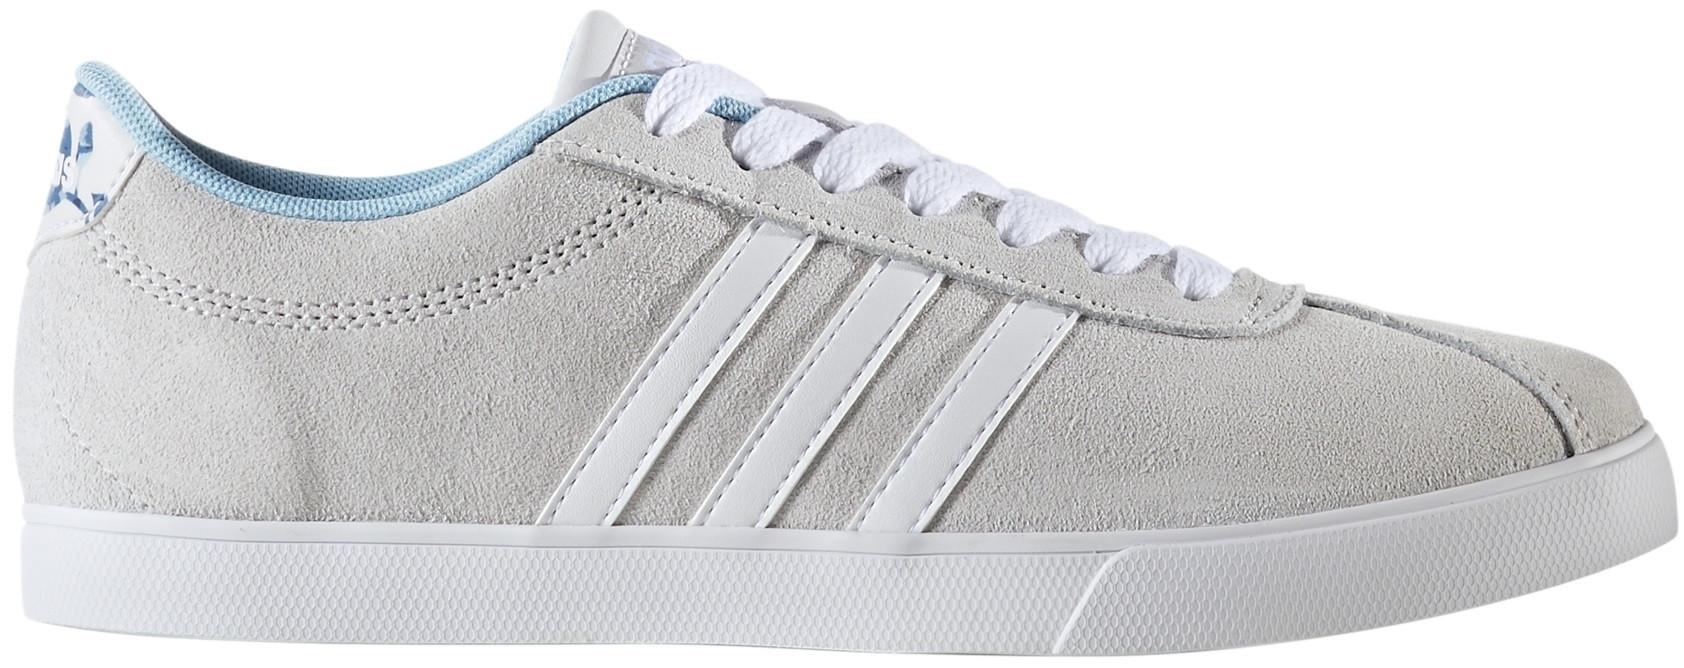 Adidas Neo Shoes Courtset W Light Grey